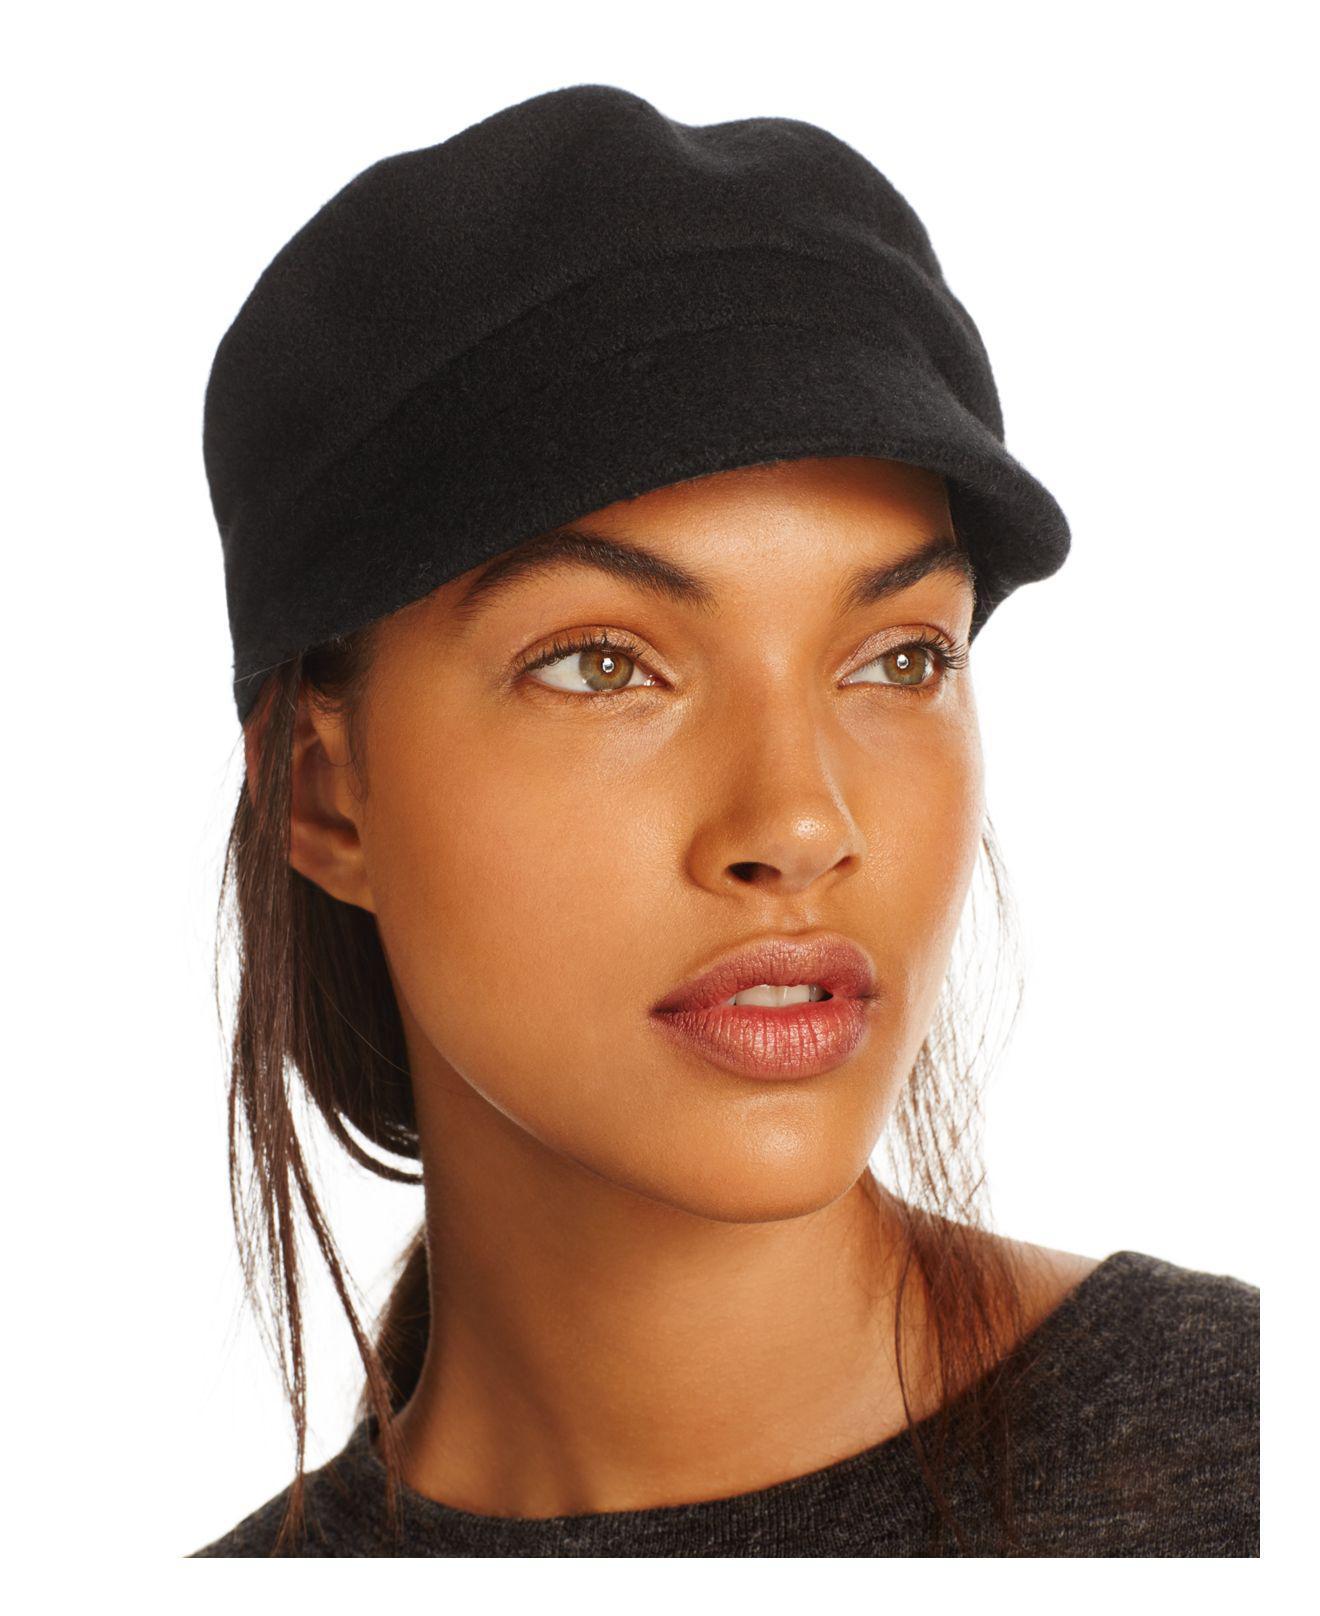 3c02d049357 Lyst - August Hat Company August Accessories Melton Mod Cap in Black